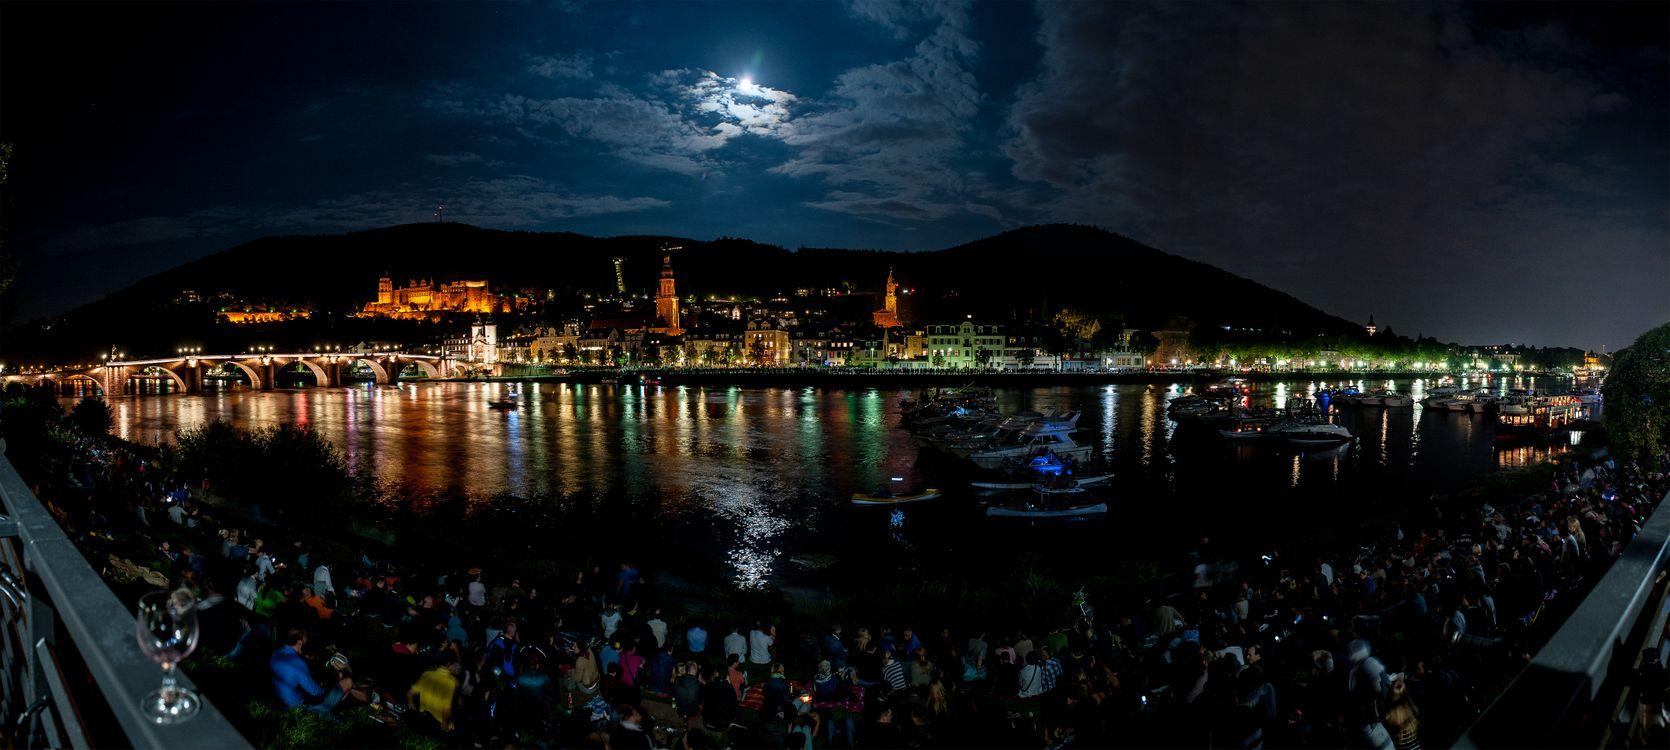 Фото бесплатно Heidelberg at night, лунная ночь, облака - на рабочий стол